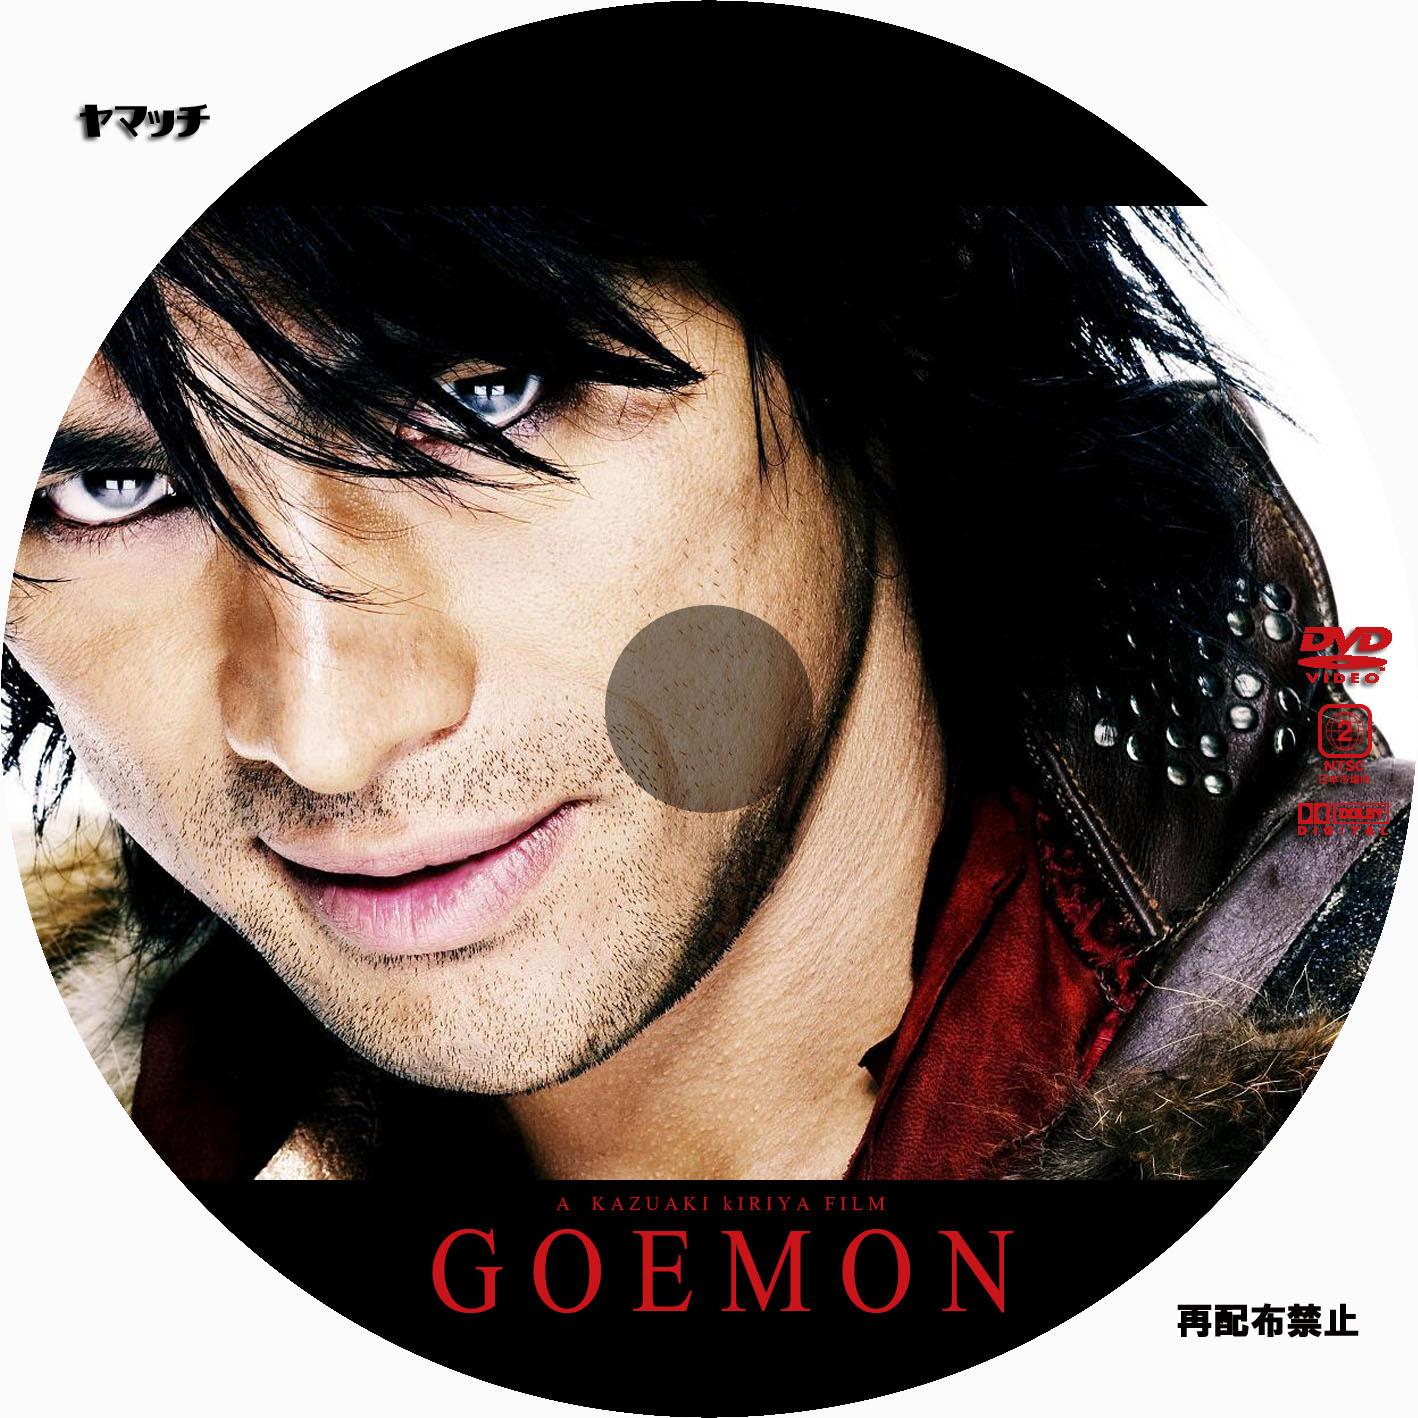 GOEMON (映画)の画像 p1_39